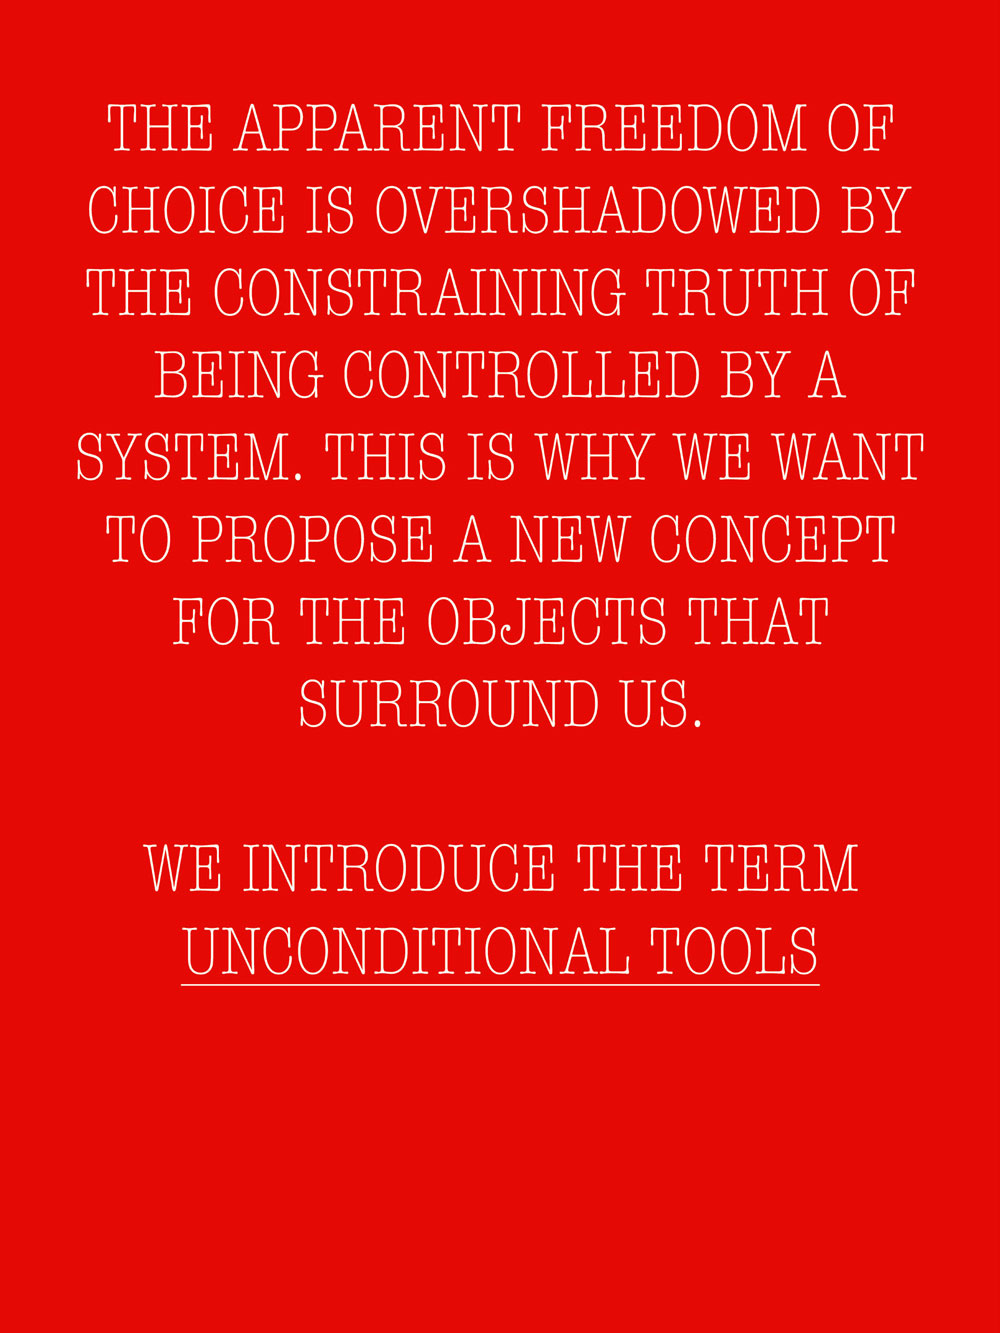 UNCONDITIONAL TOOLS